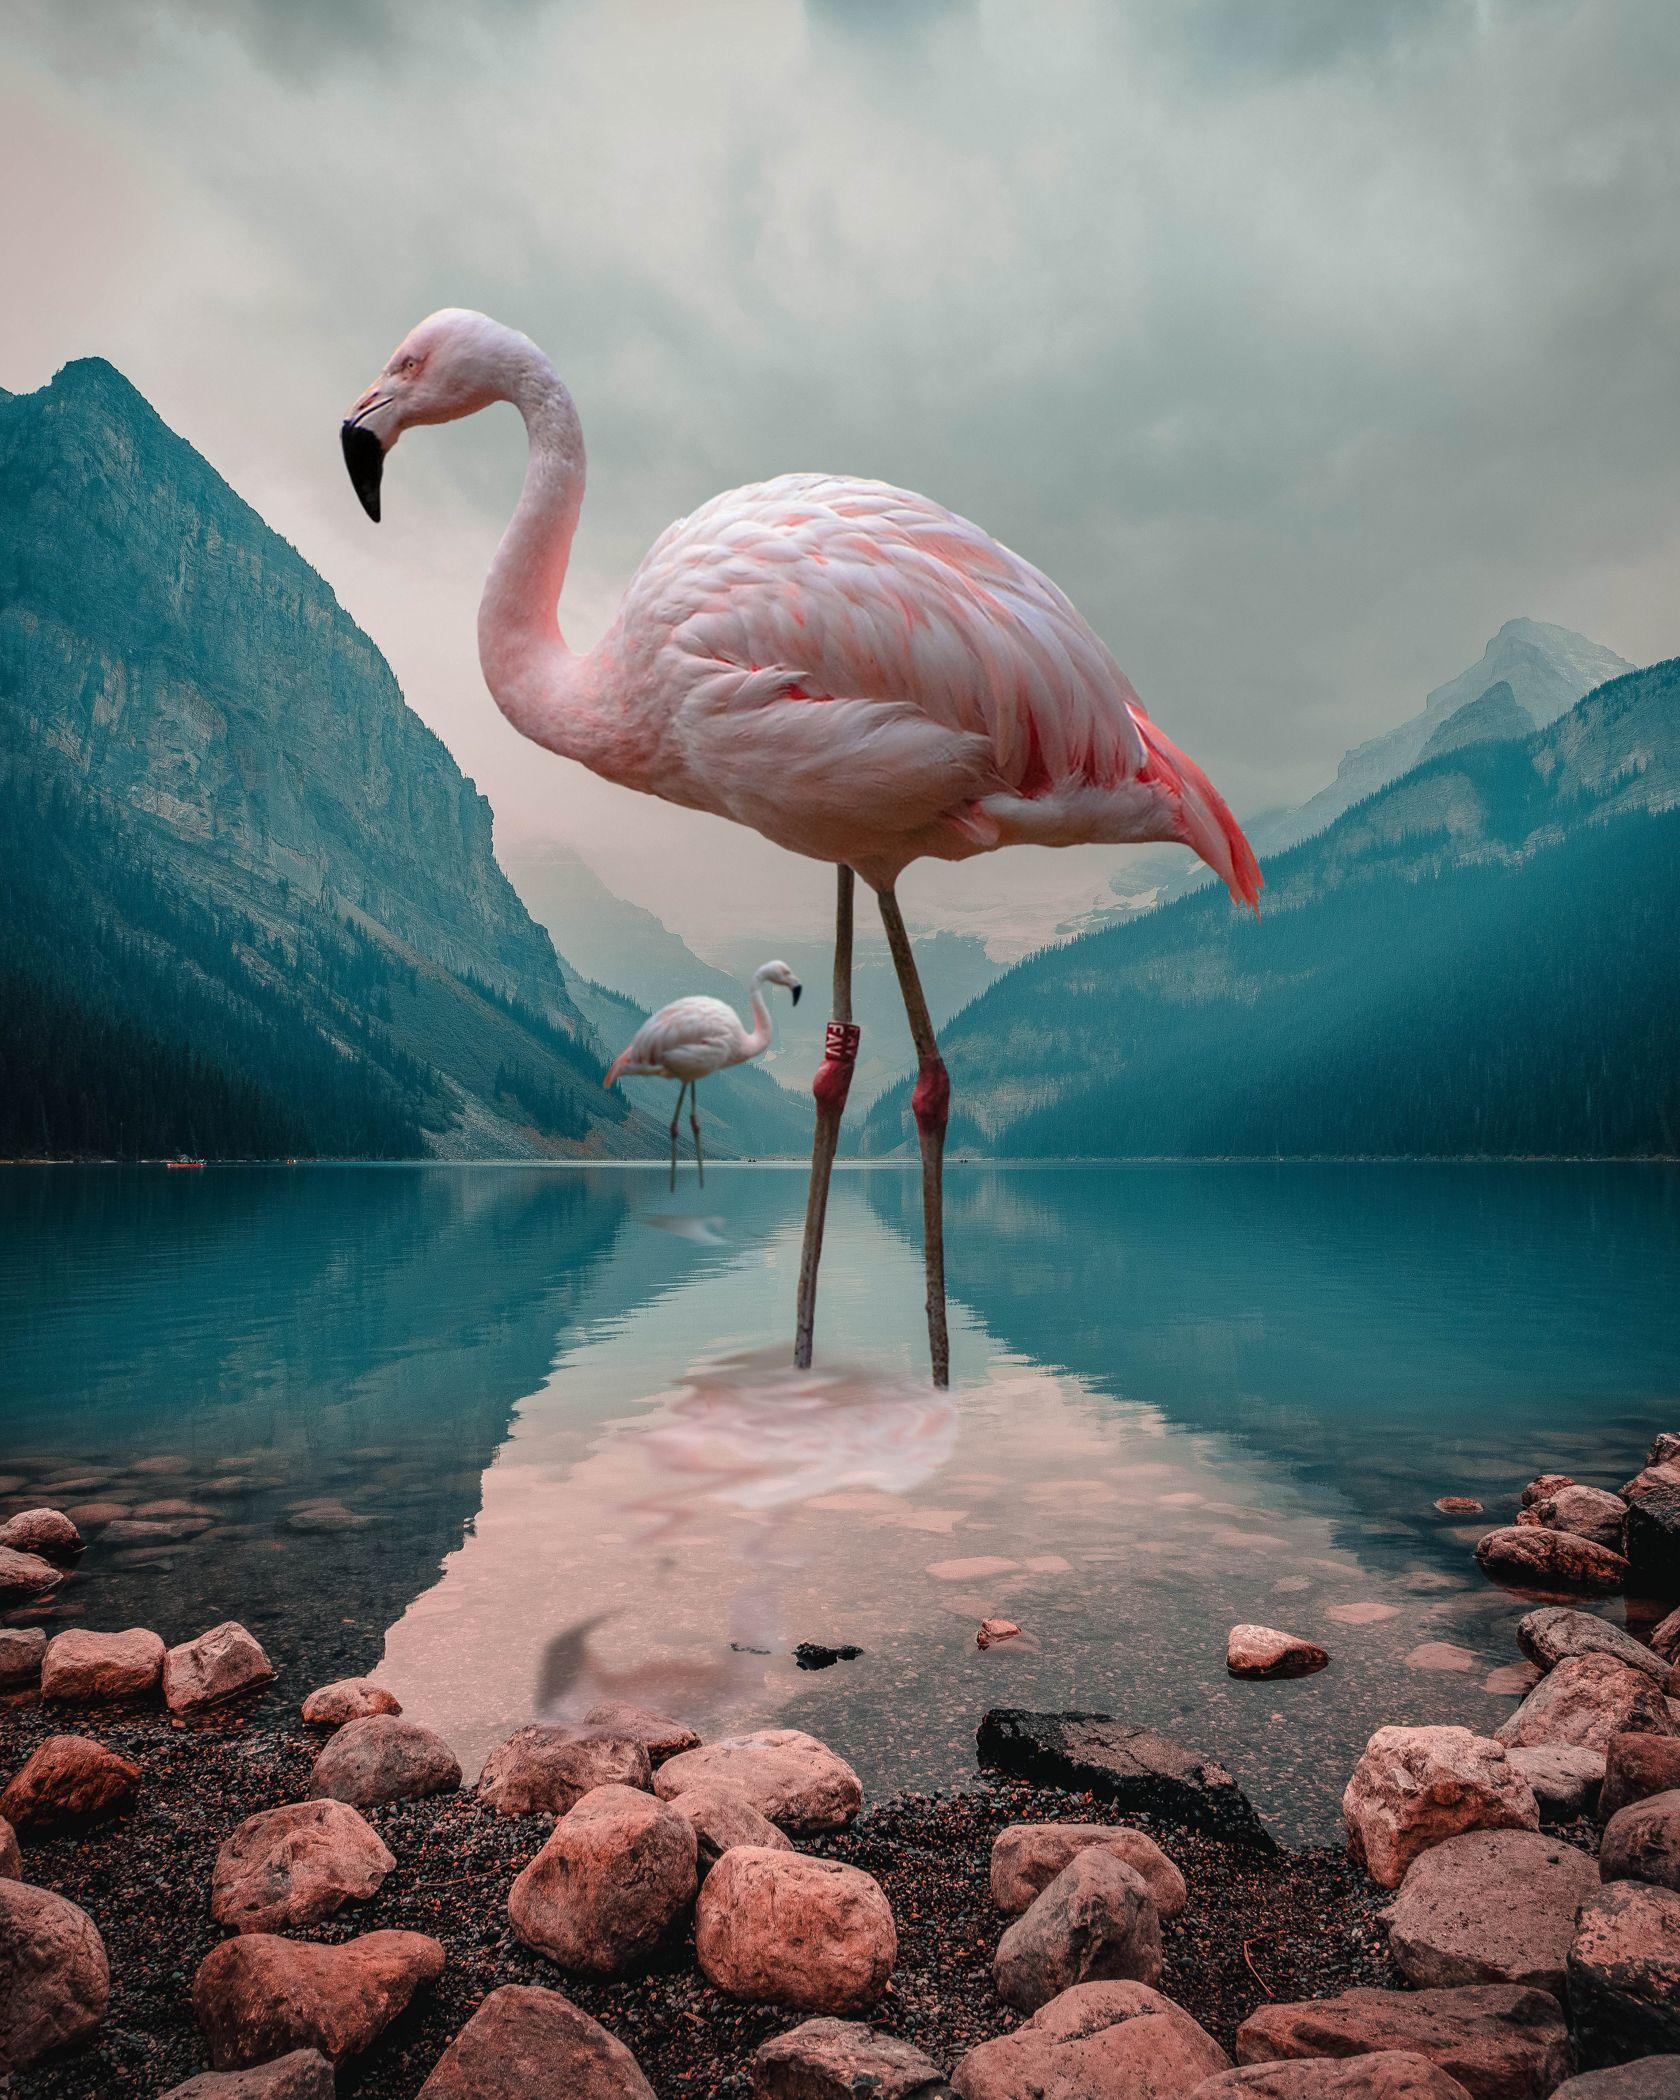 flamingo, mountain, landscape